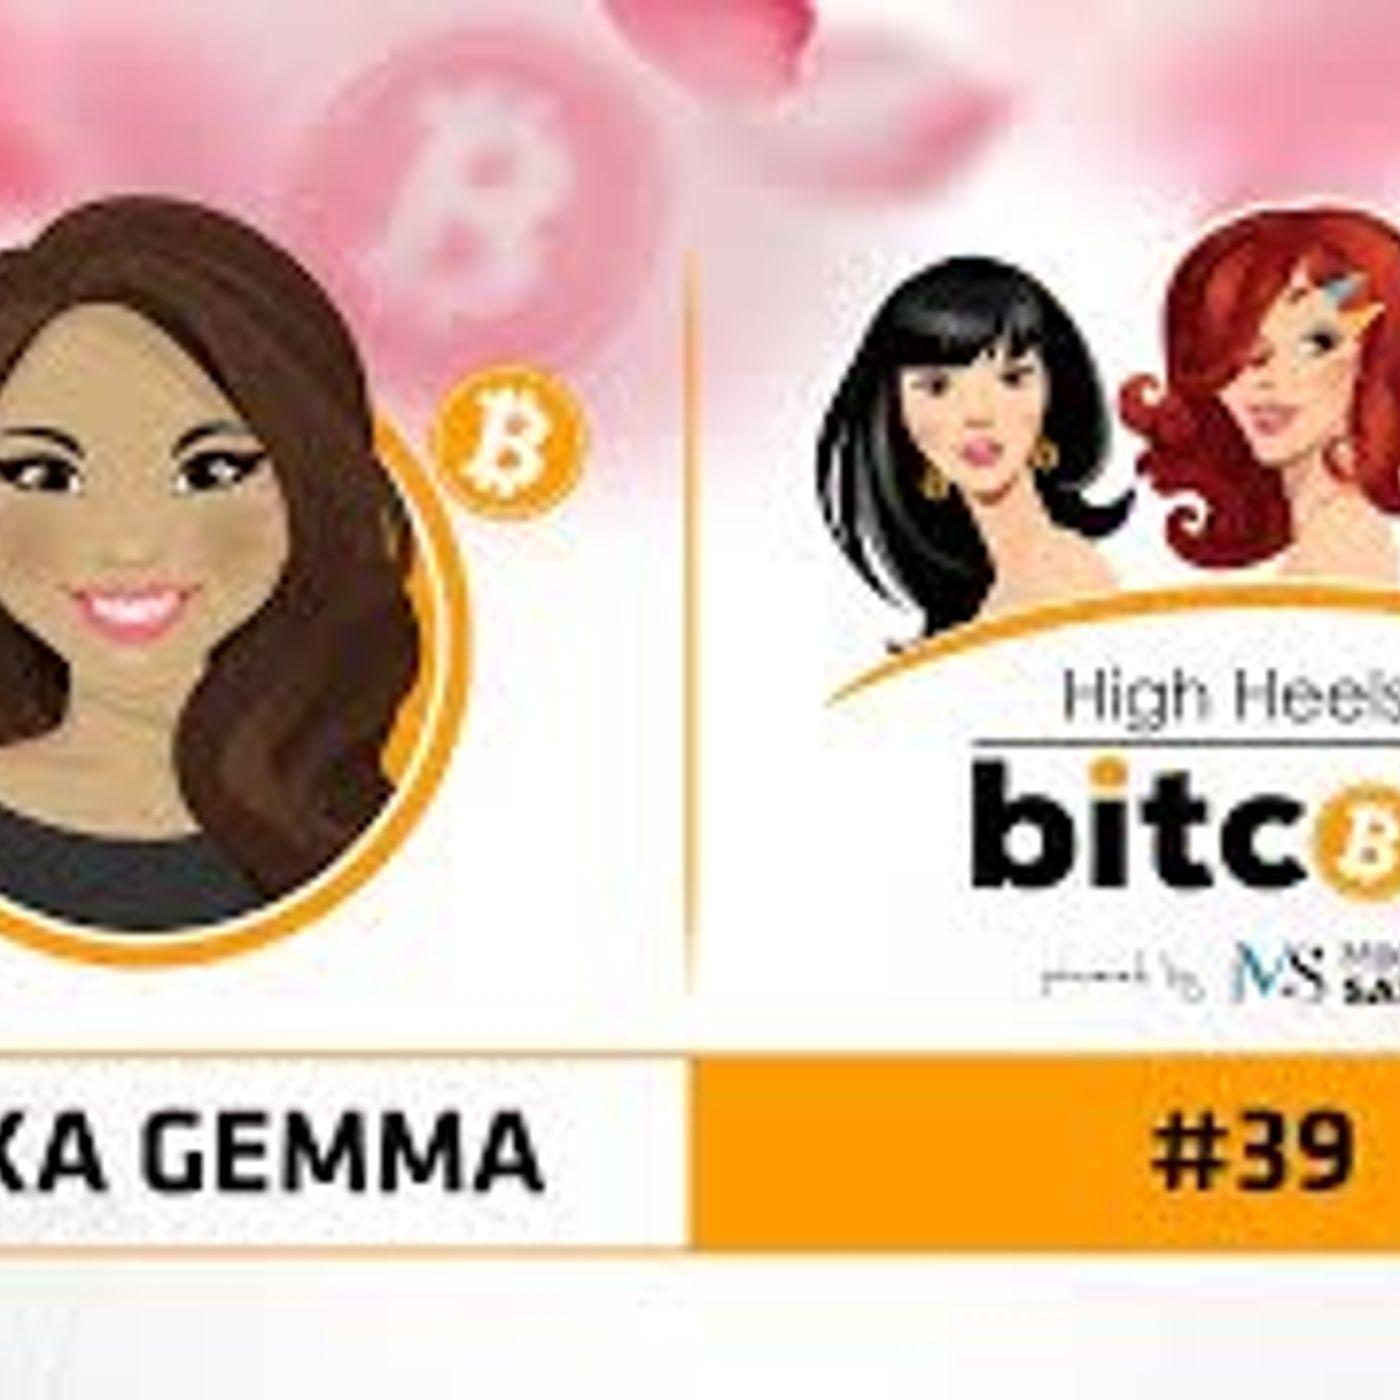 High Heels of Bitcoin #39 | Eryka Gemma - CEO Bitcoin Center Miami